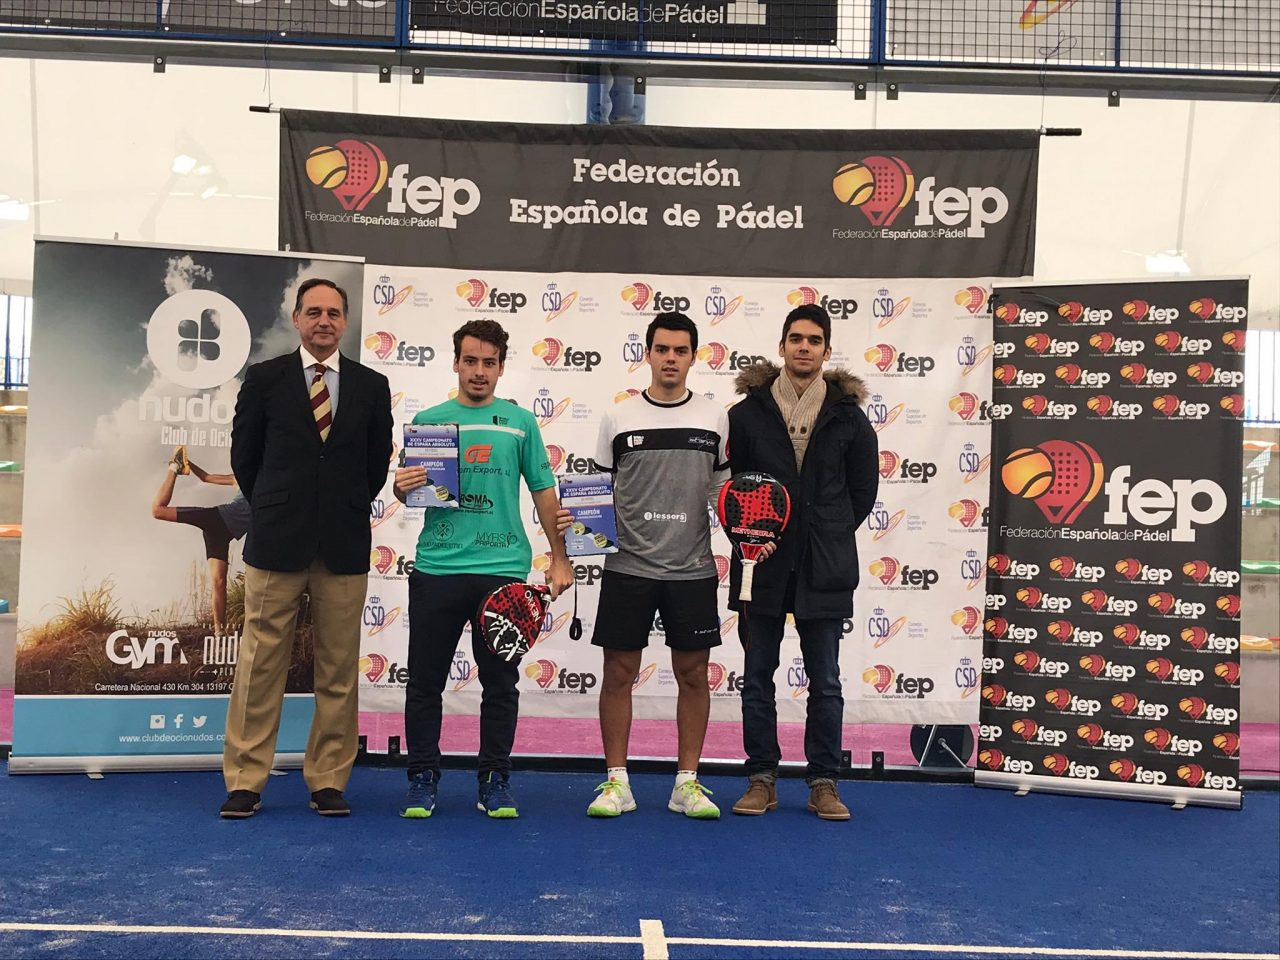 javi rico coki nieto campeones espana padel 2019